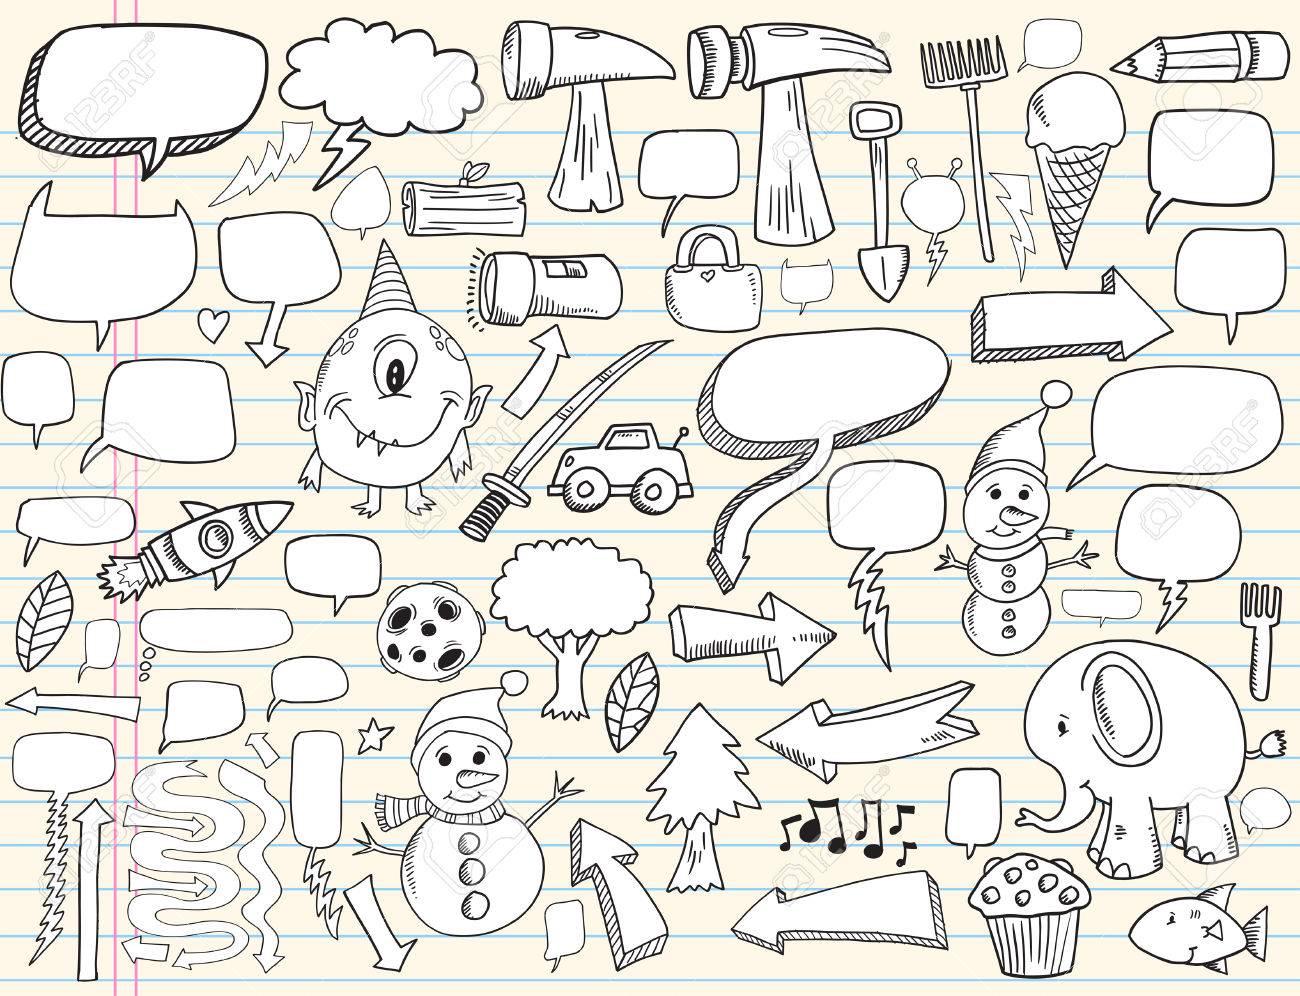 Notebook Doodle Speech Bubble Design Elements Mega Illustration Set Stock Vector - 7261094